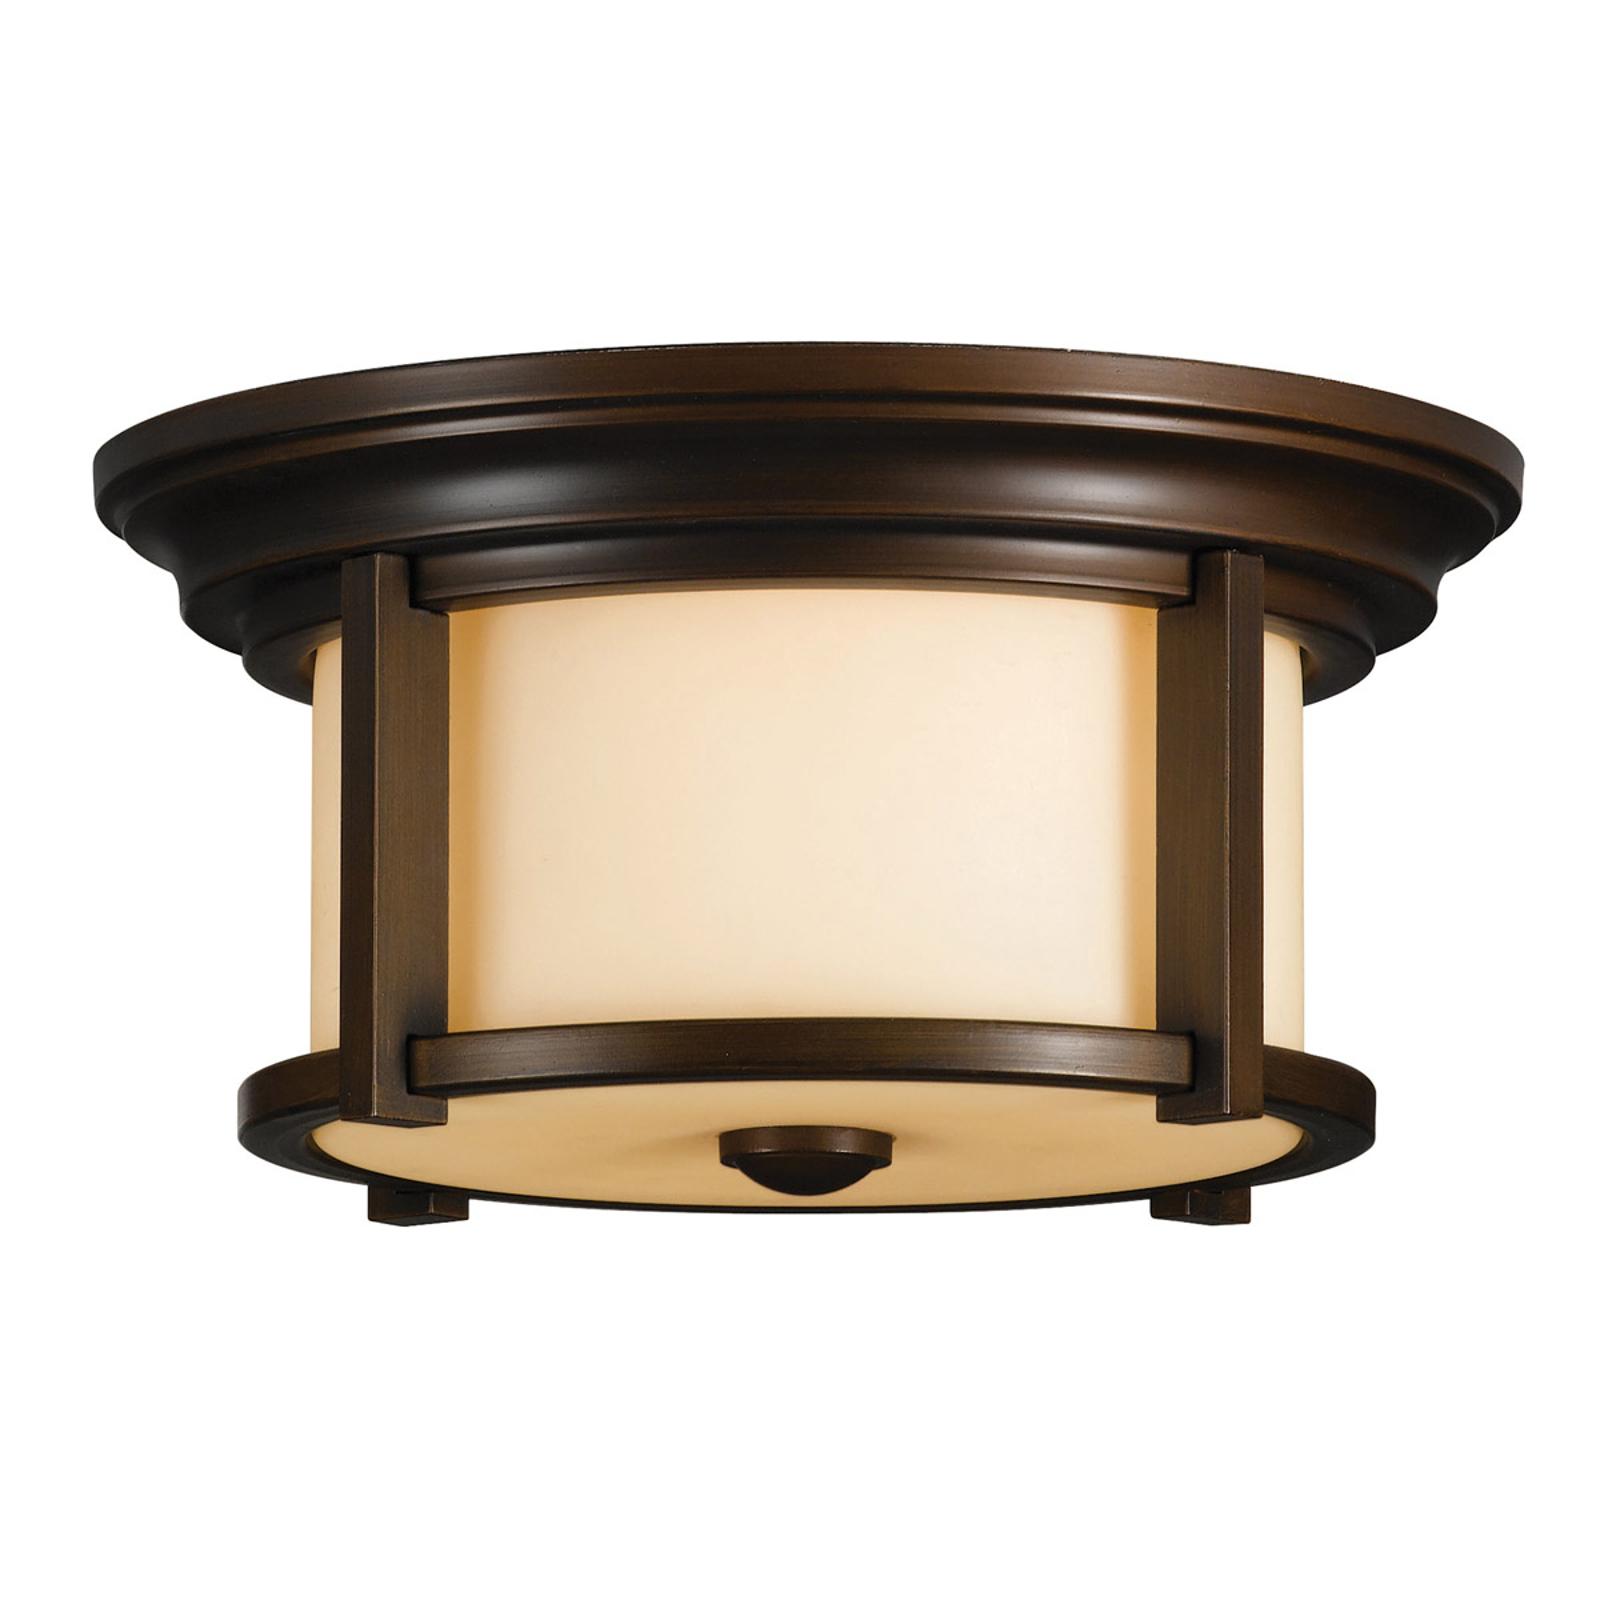 Utomhustaklampa Merrill i brons